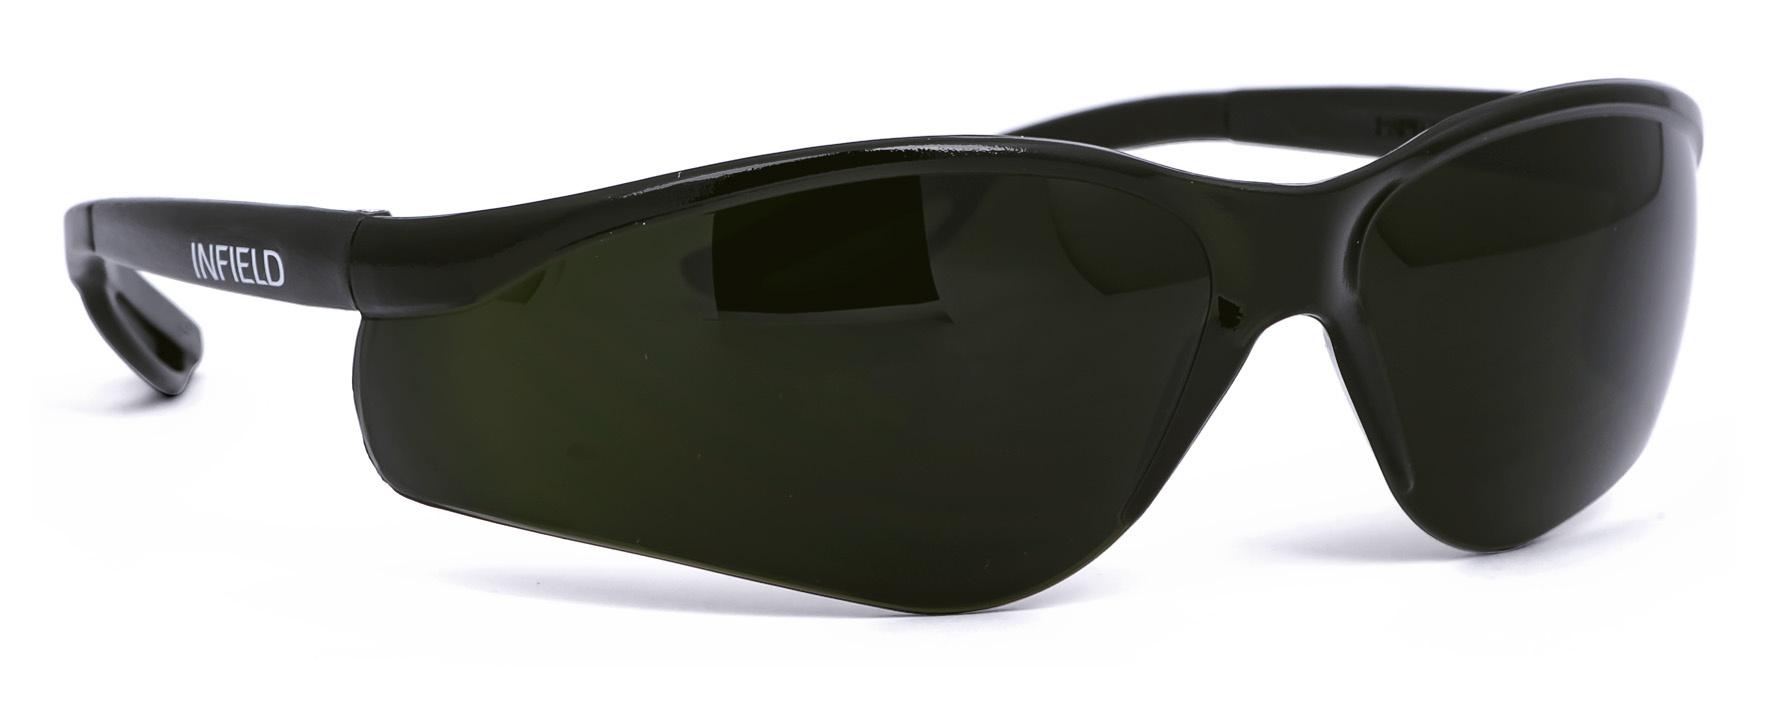 32b564701f Raptor infield safety jpg 1772x709 Haymaker sunglasses black